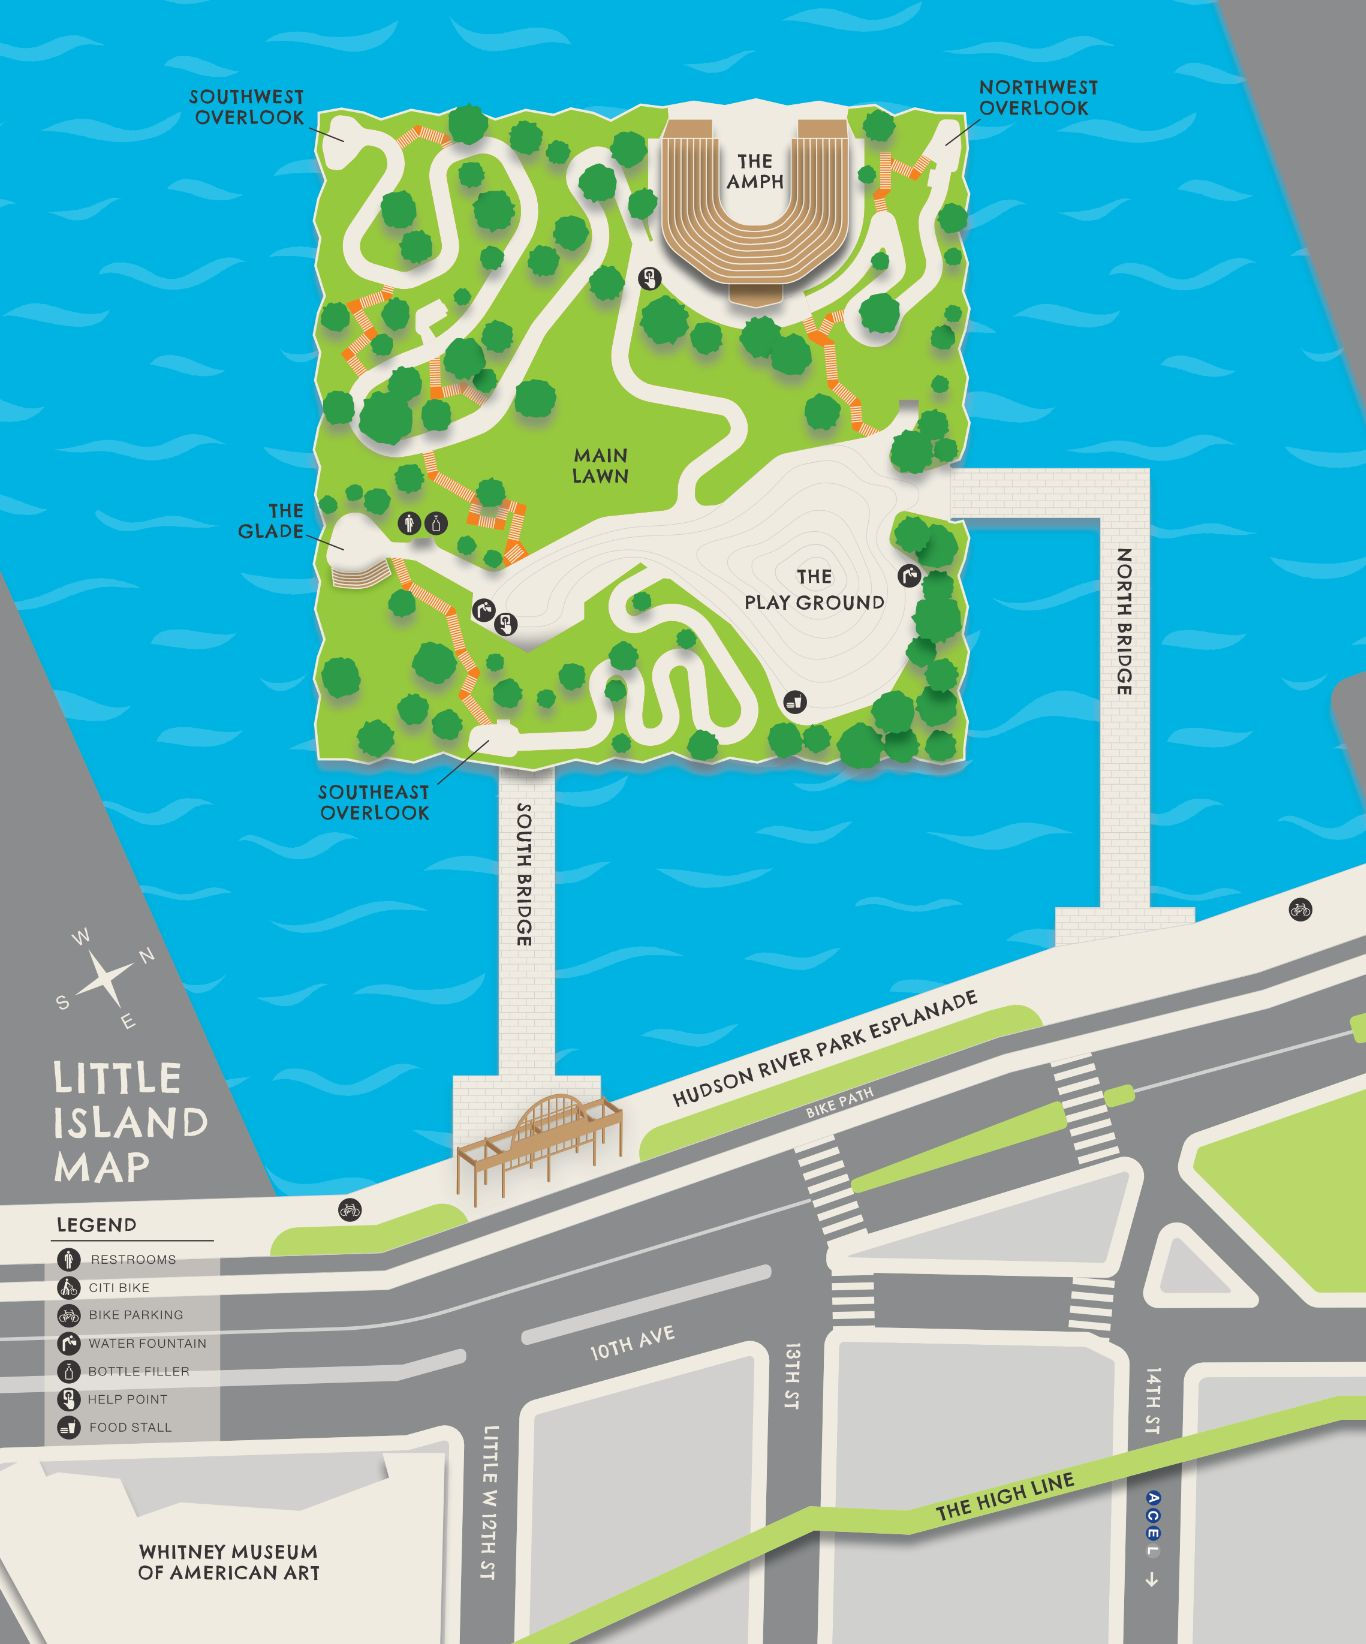 Map of Little Island